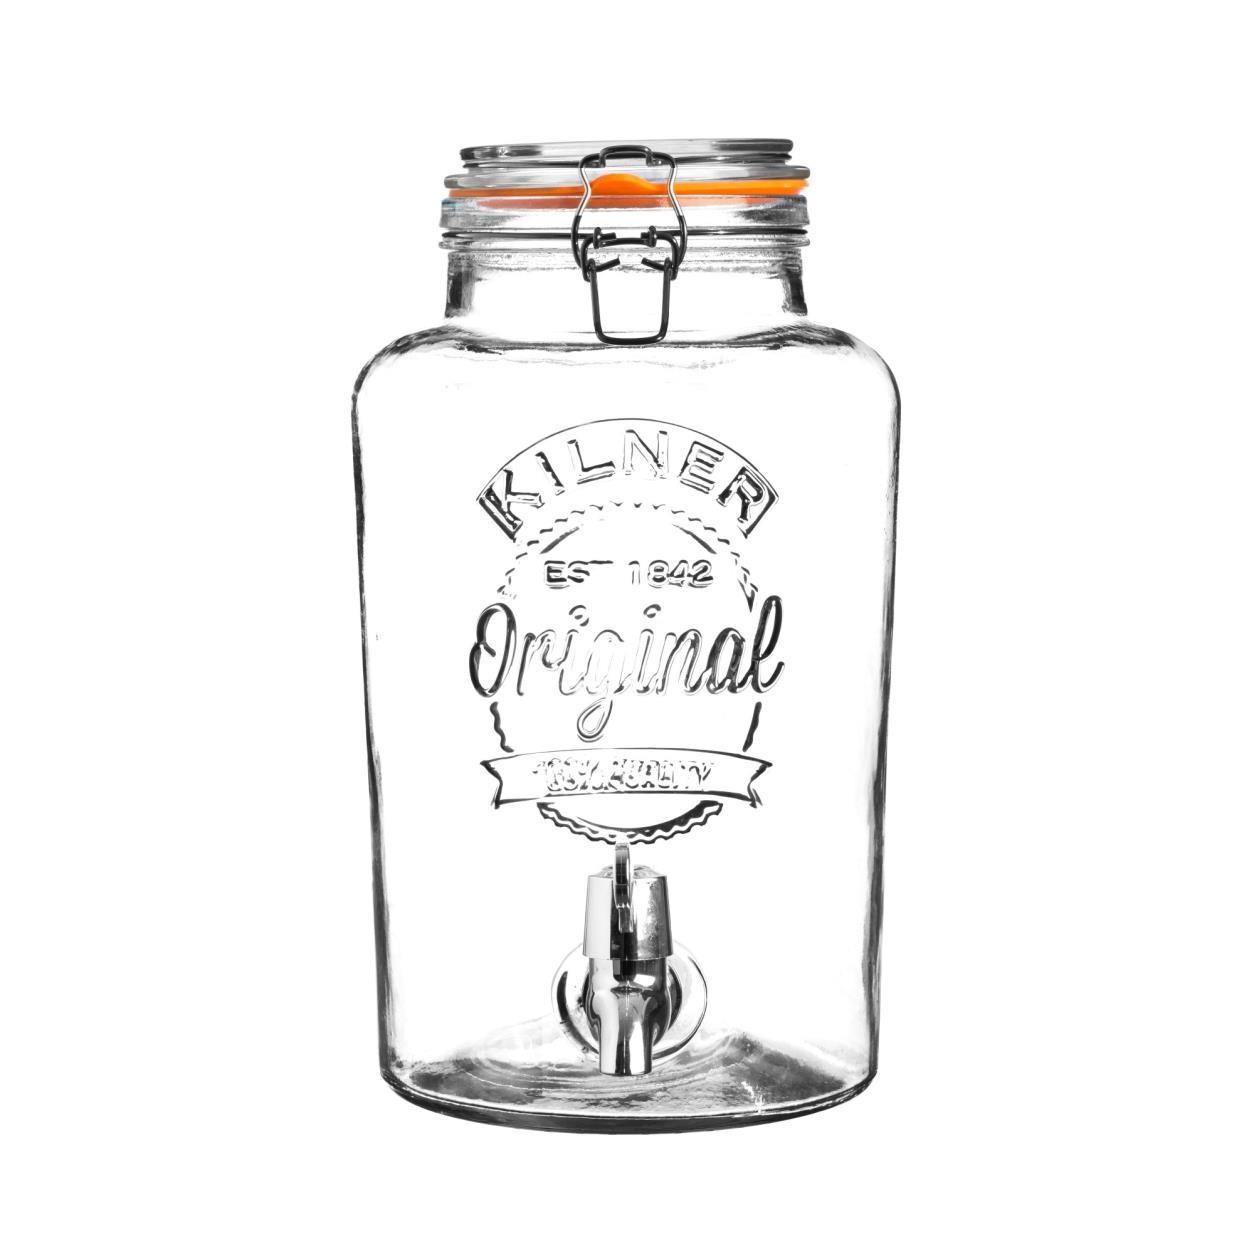 CLIP TOP DRINKS DISPENSER 1.3 GALLON